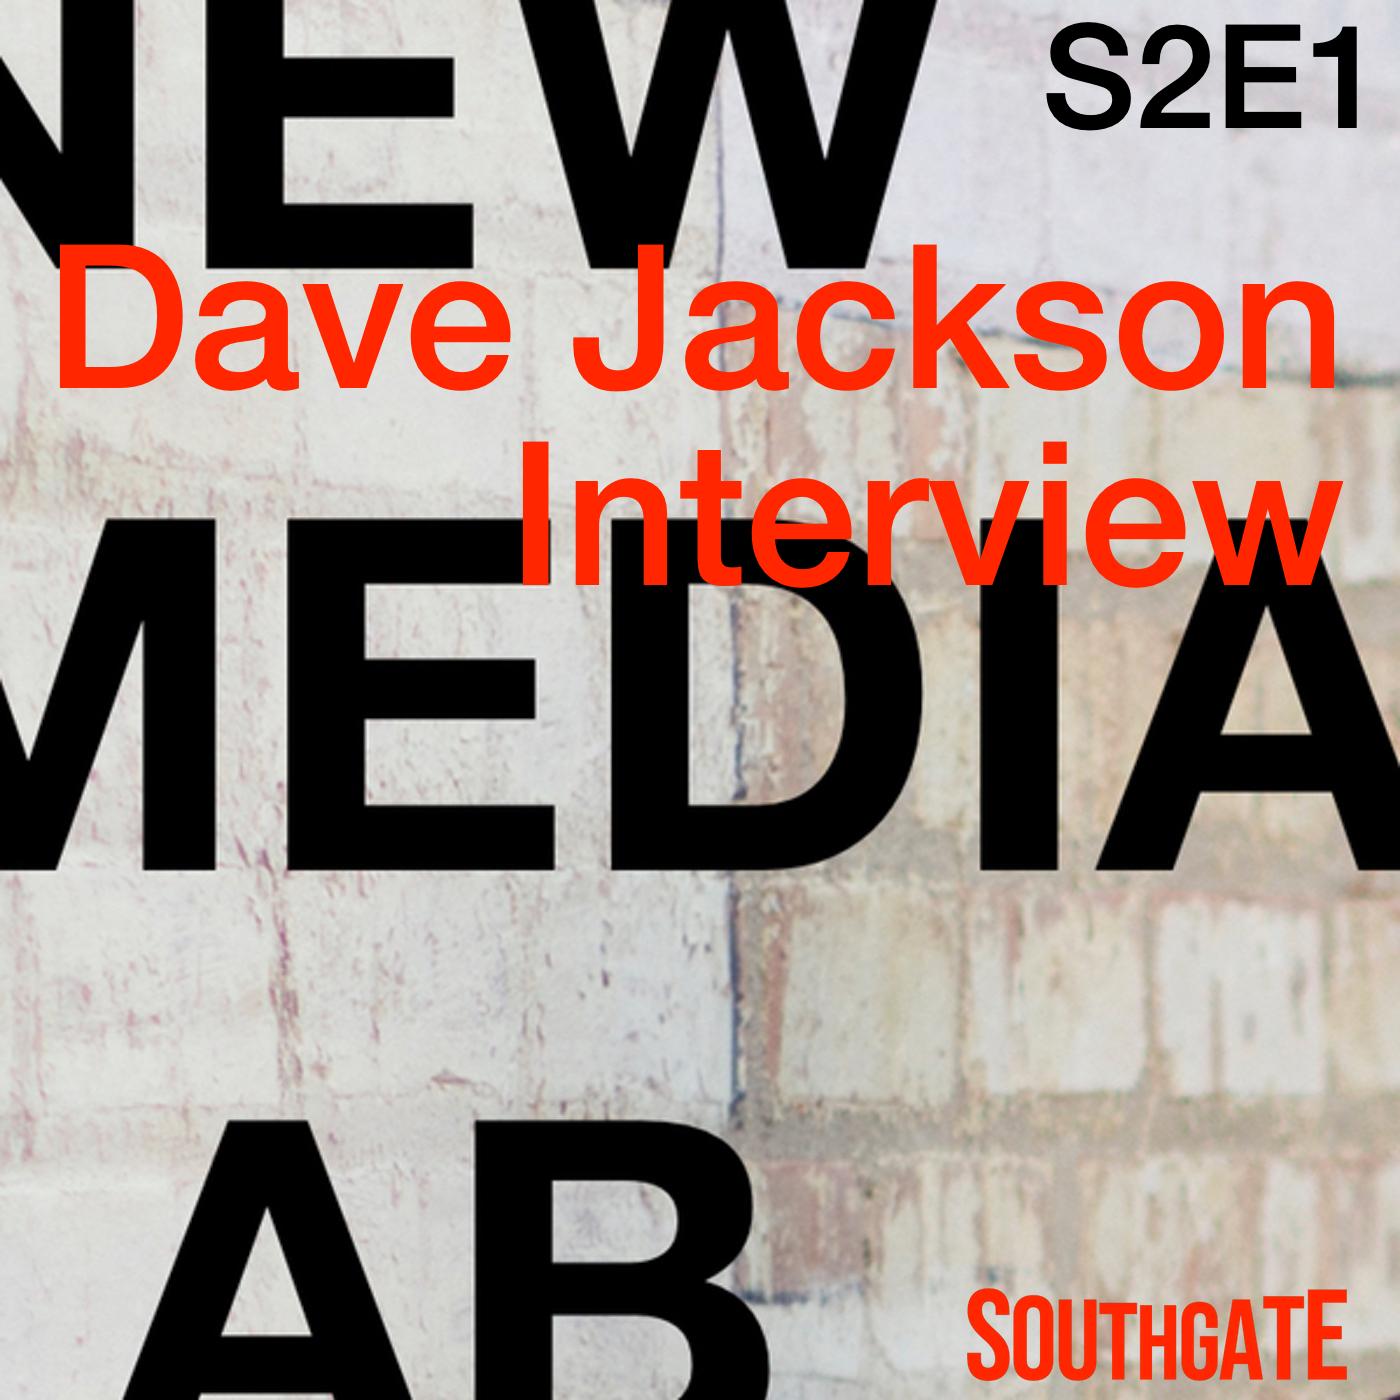 Dave Jackson Interview